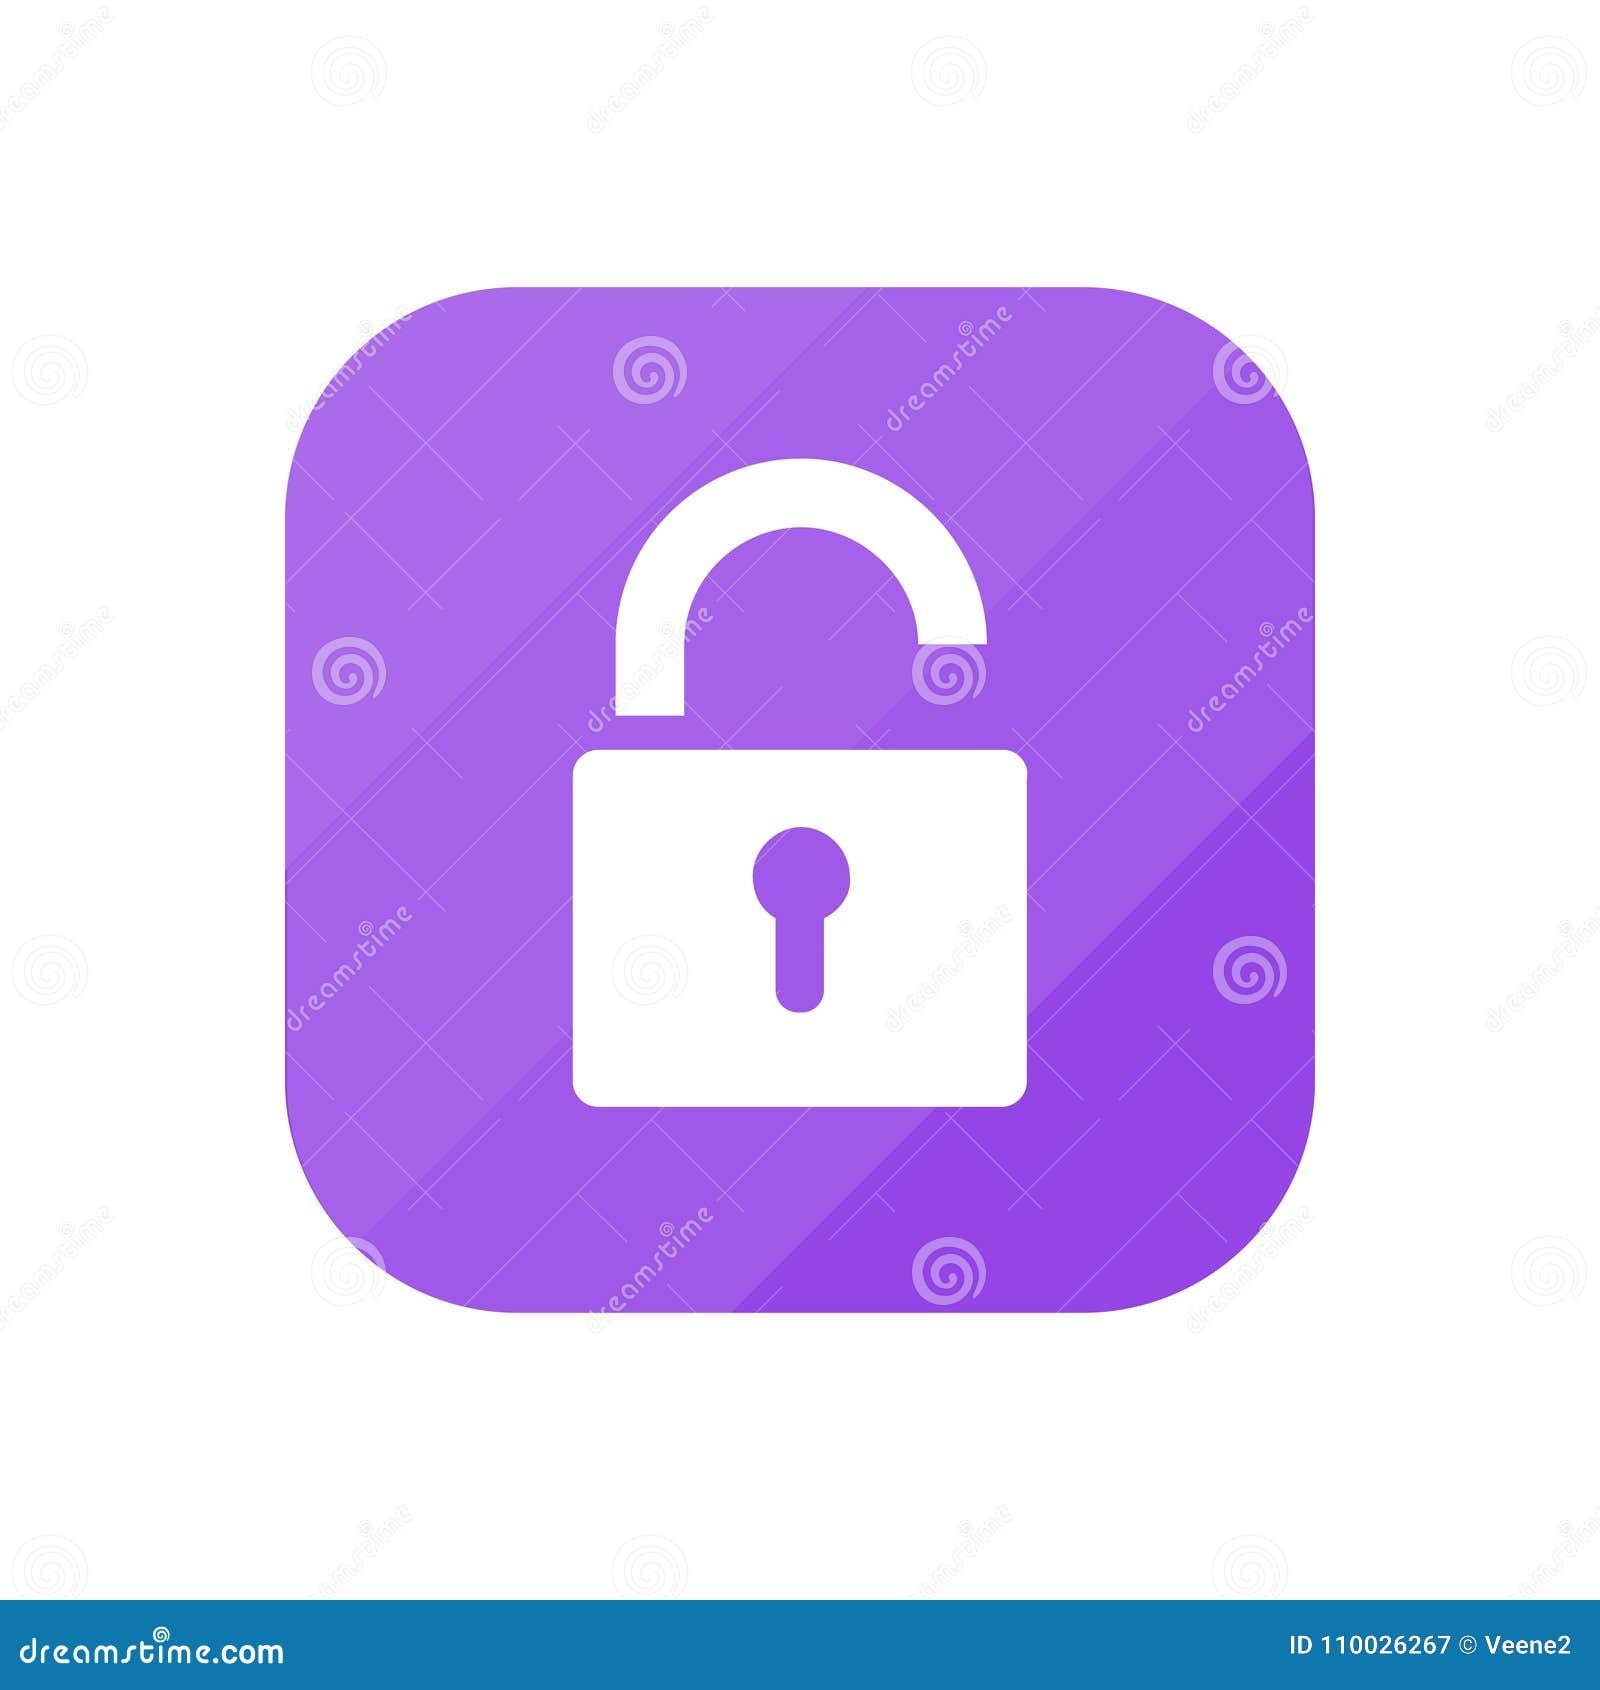 Open - App Pictogram